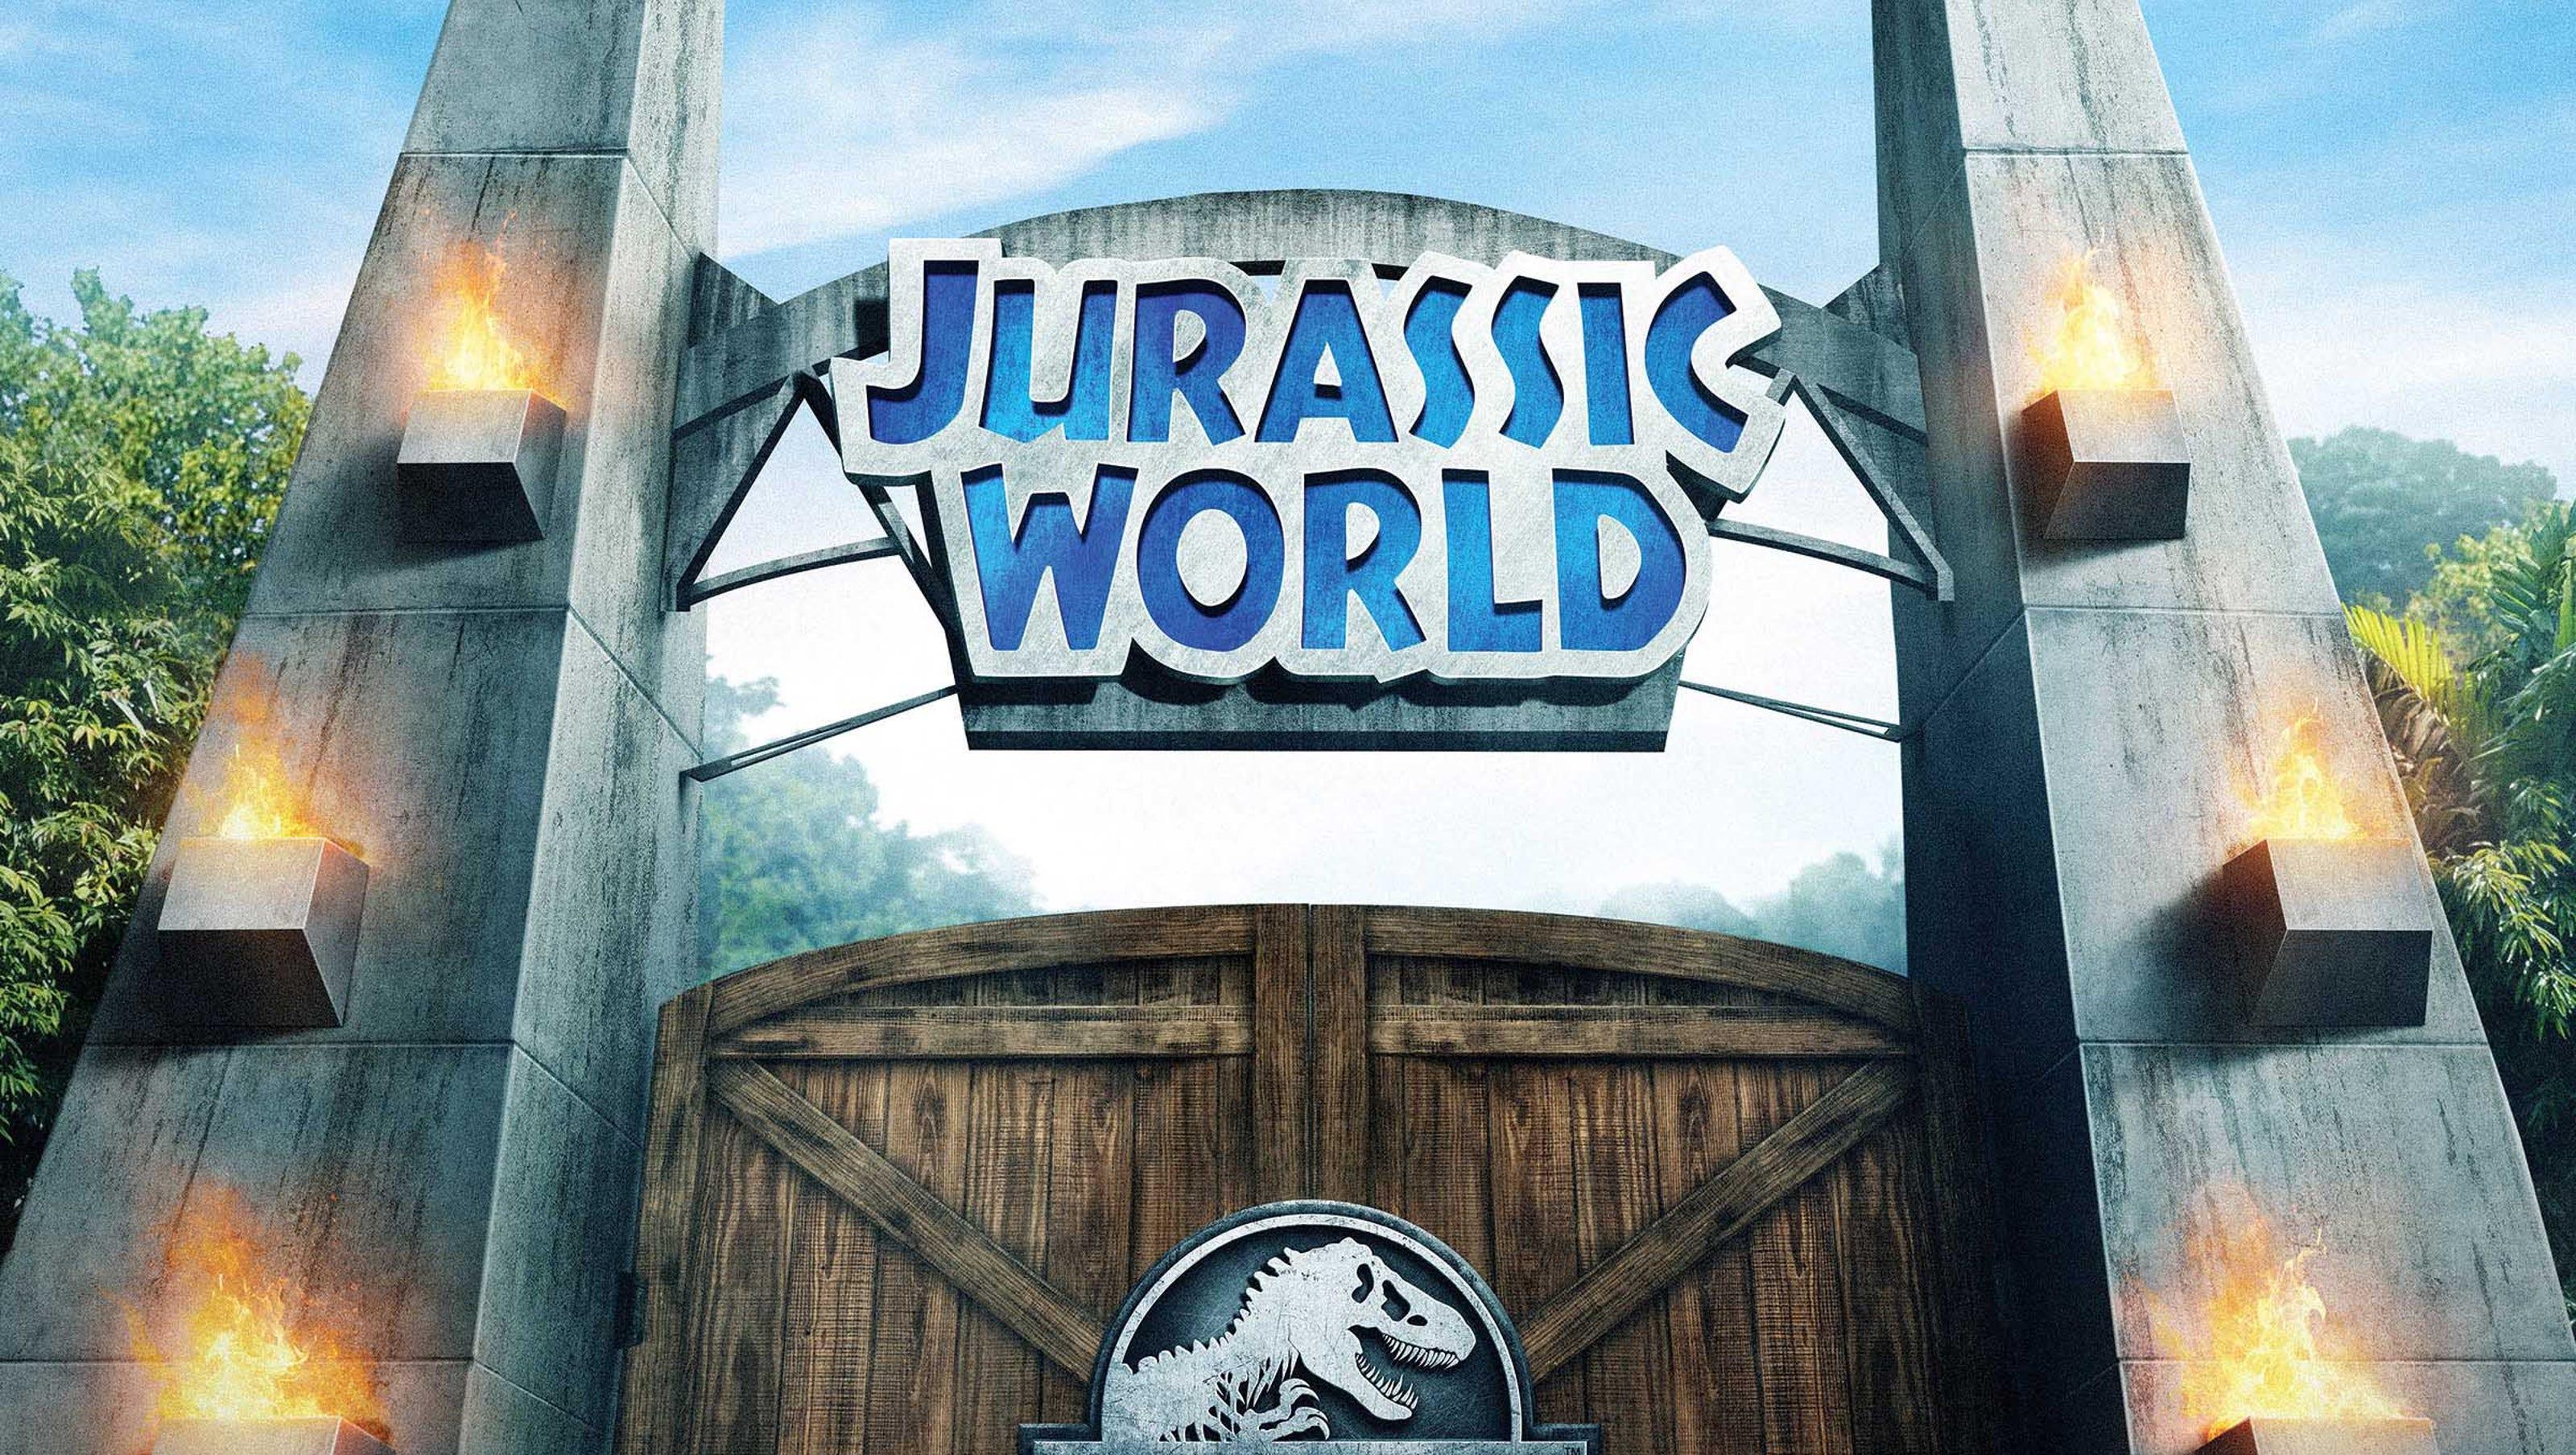 Jurassic World Ride Evolves From Jurassic Park At Universal Hollywood